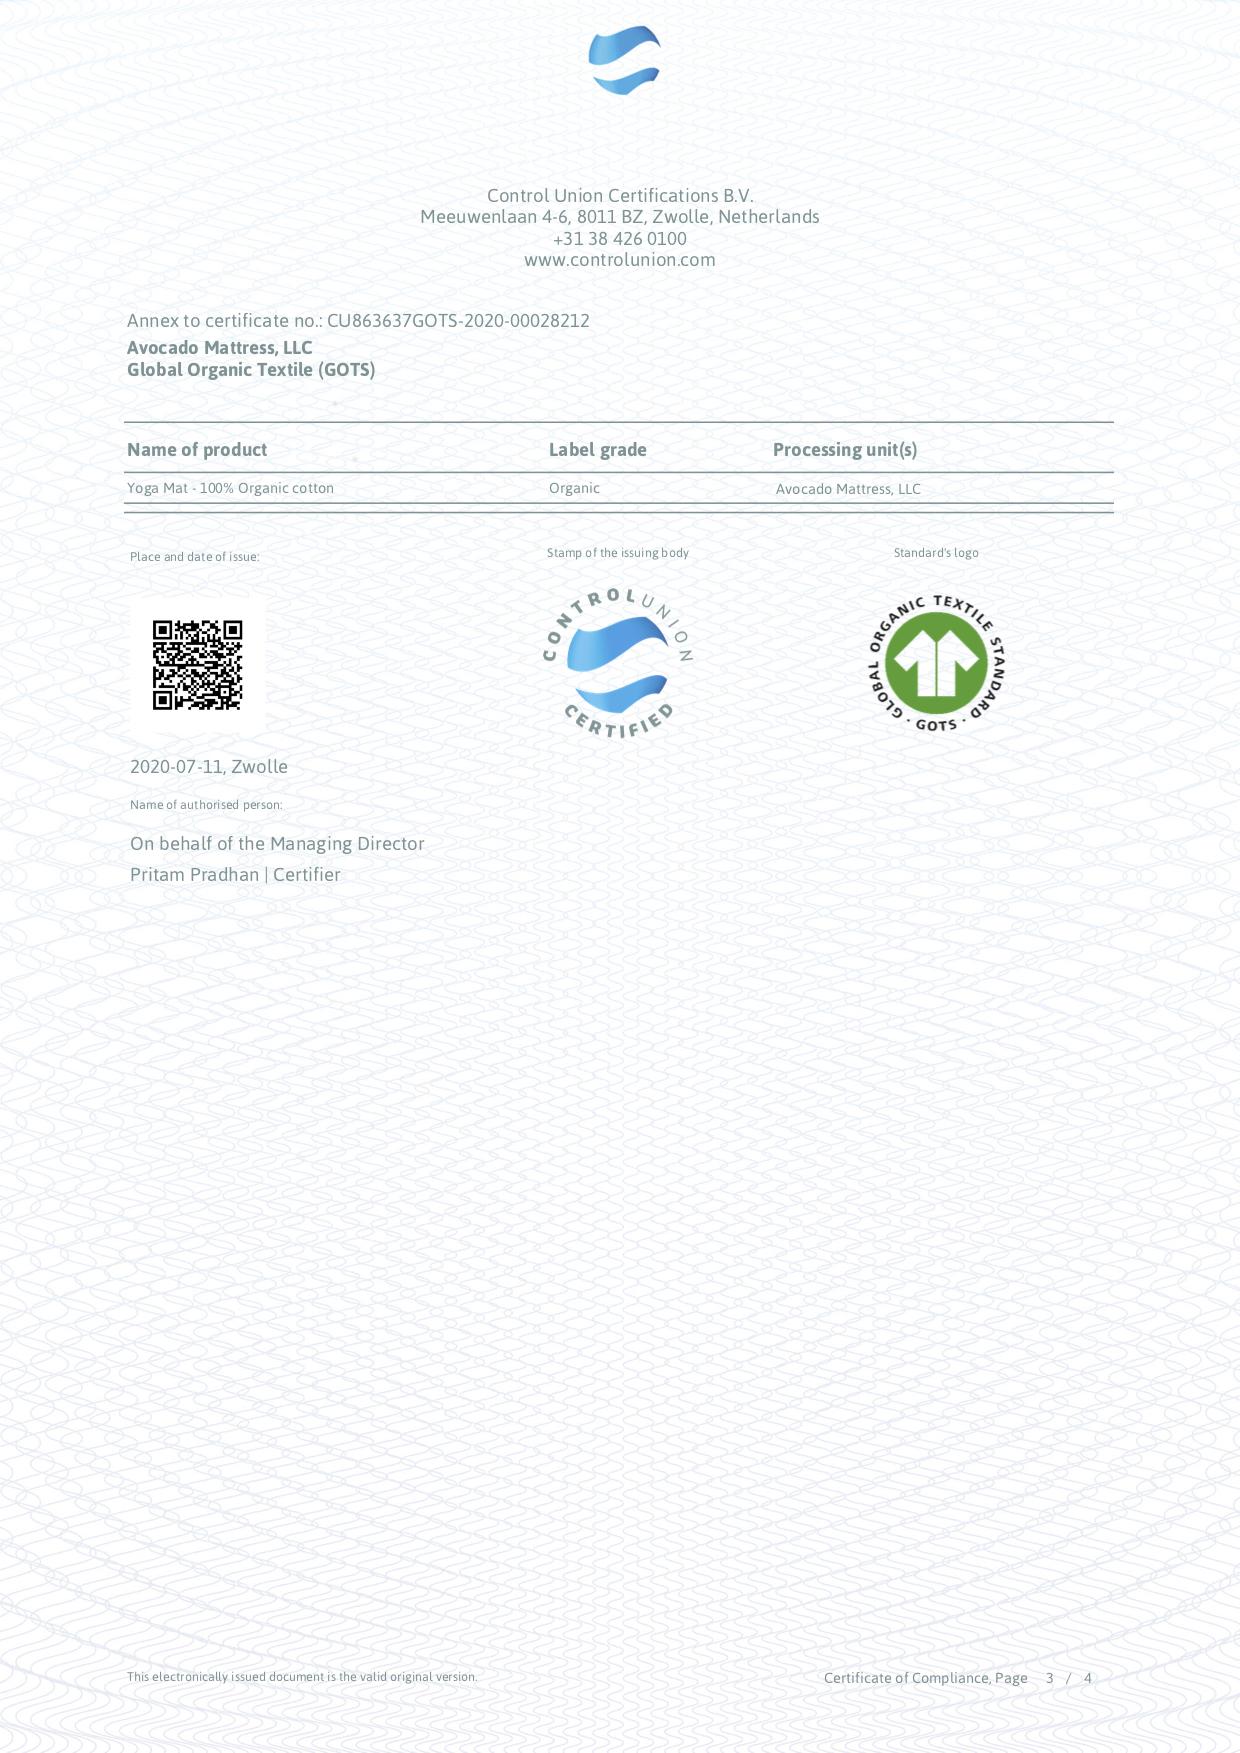 GOTS_Scope_Certificate_2020-07-11_05_29_15_UTC_page_3.jpg